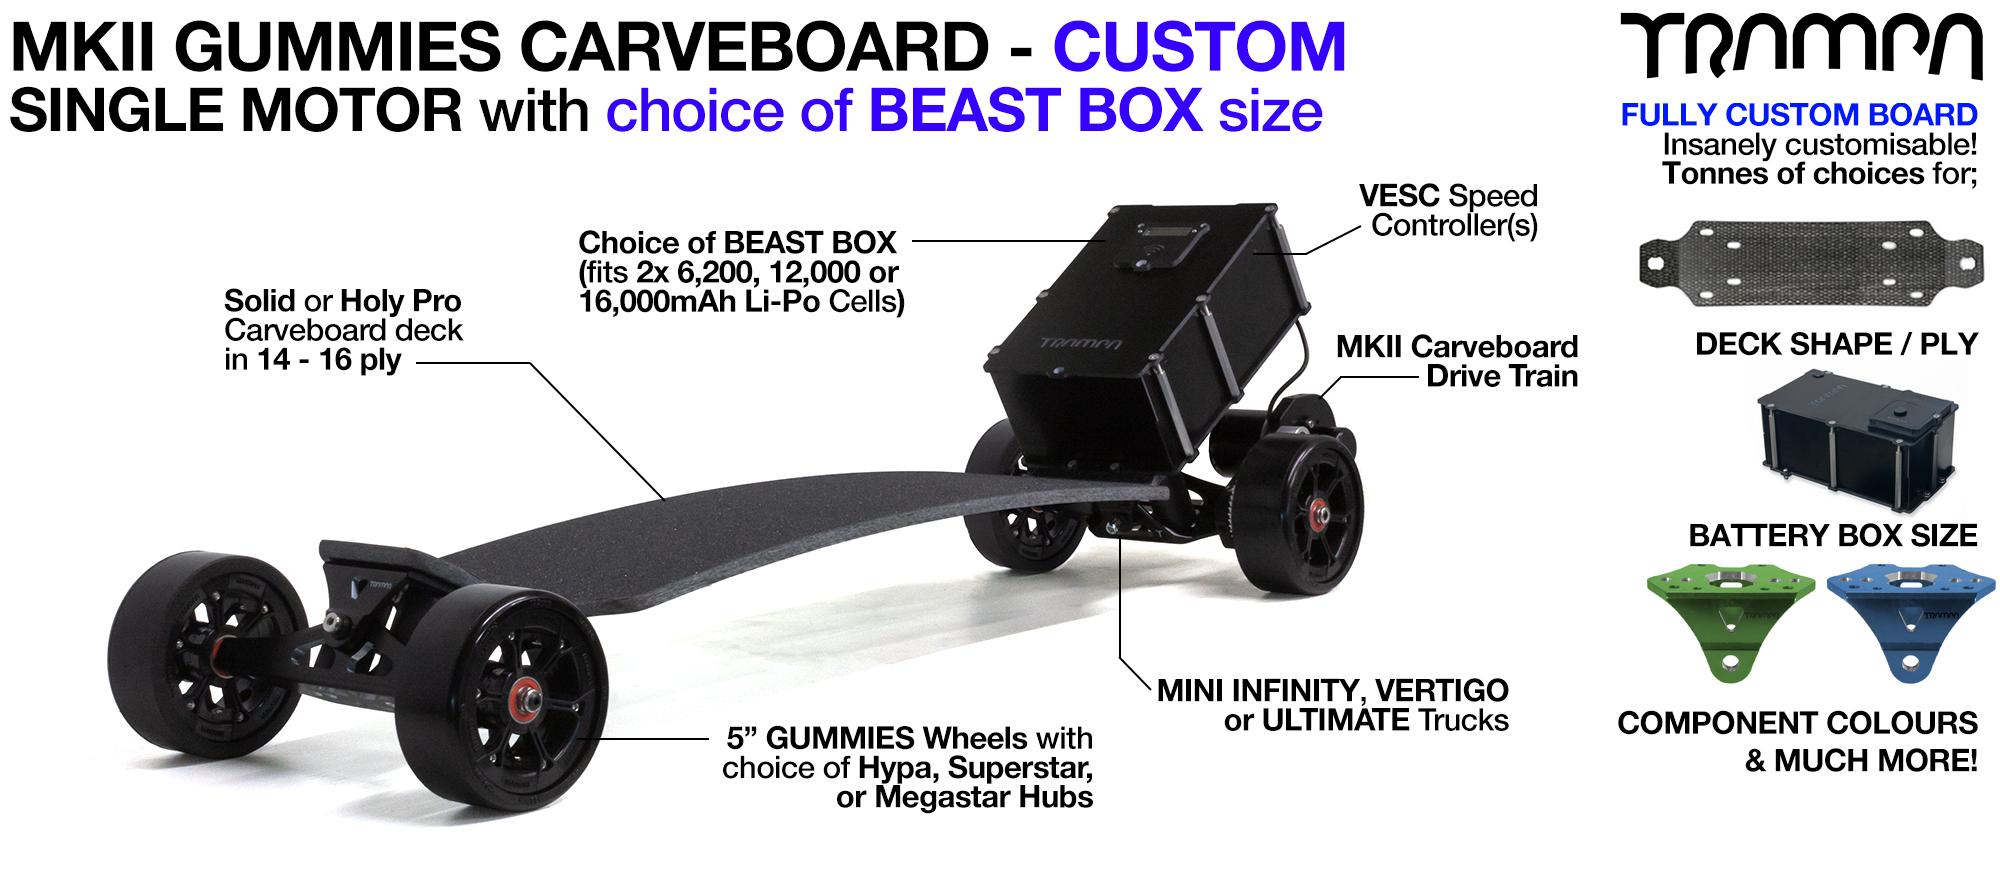 TRAMPA's MkII Electric GUMMIES Carveboard - uses Mini Spring Trucks with MkII Carve board Motor Mount,s Custom TRAMPA hubs & 125mm GUMMIES longboard Tyres - SINGLE Motor CUSTOM